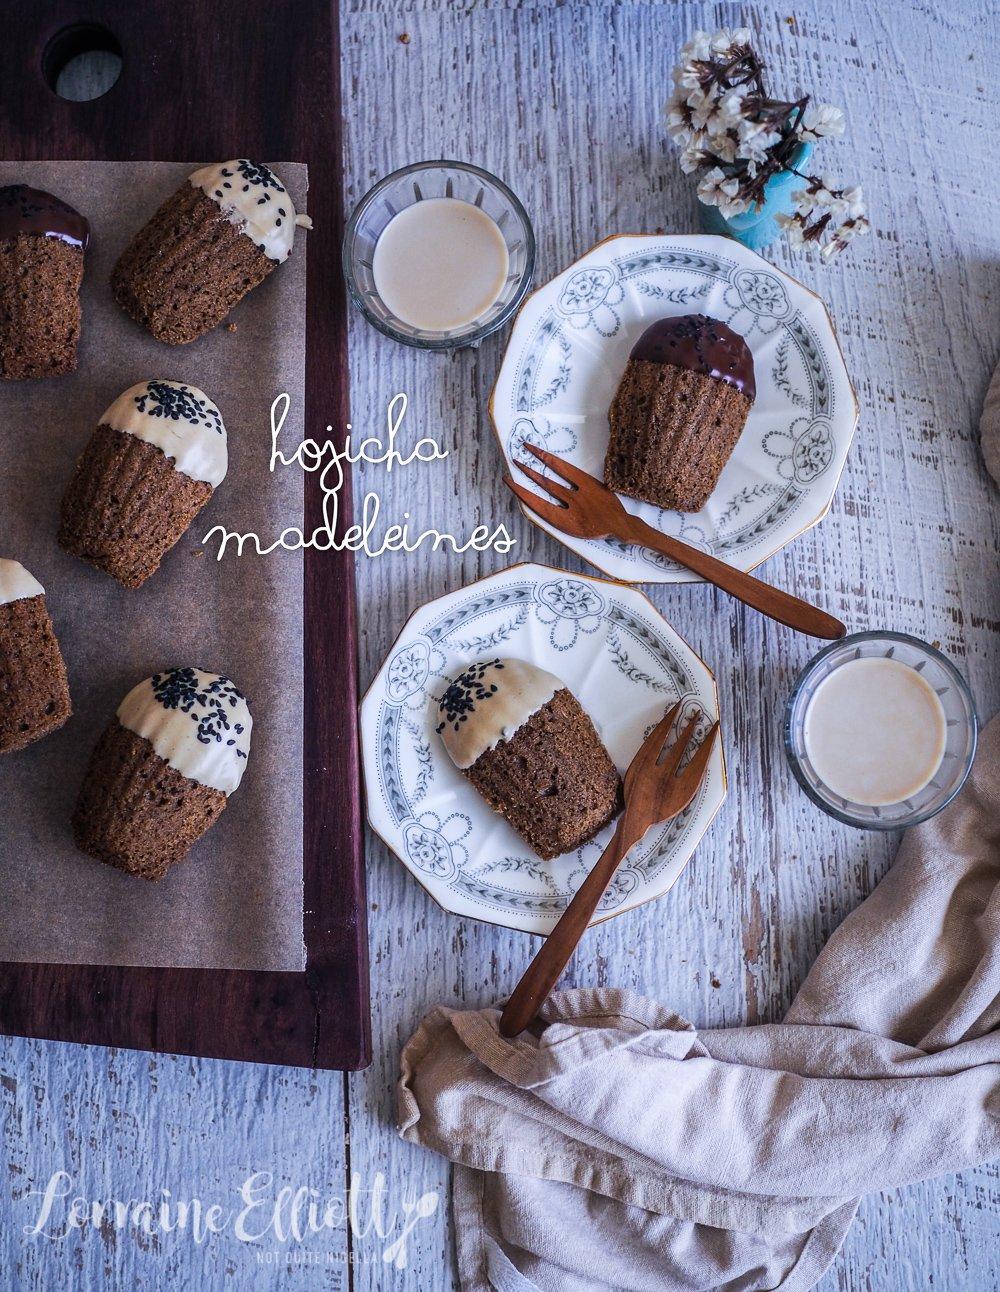 Hojicha madeleines